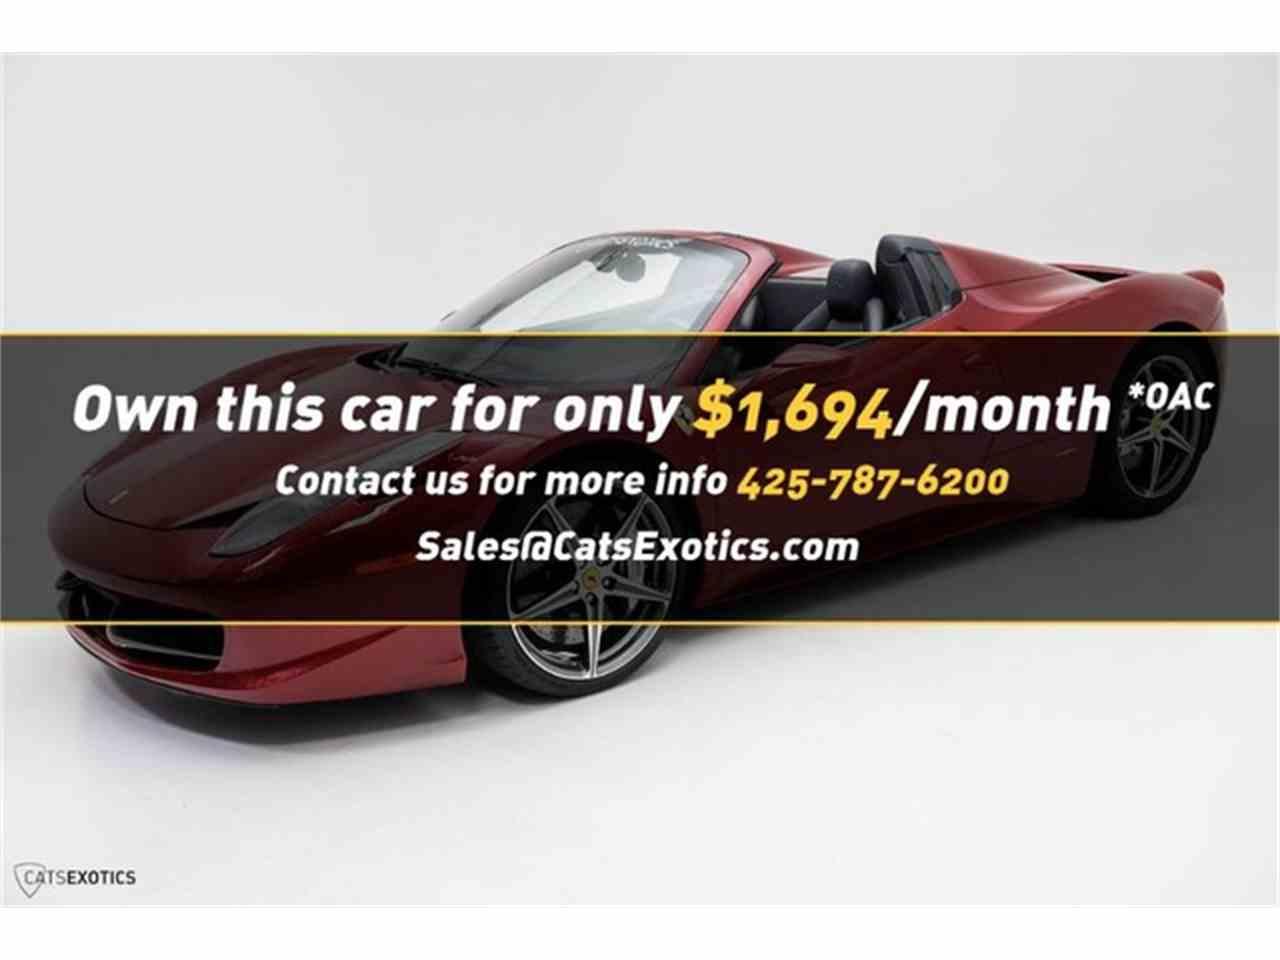 for ferrari photos seattle cars showroom sale stock sports car image in photo washington